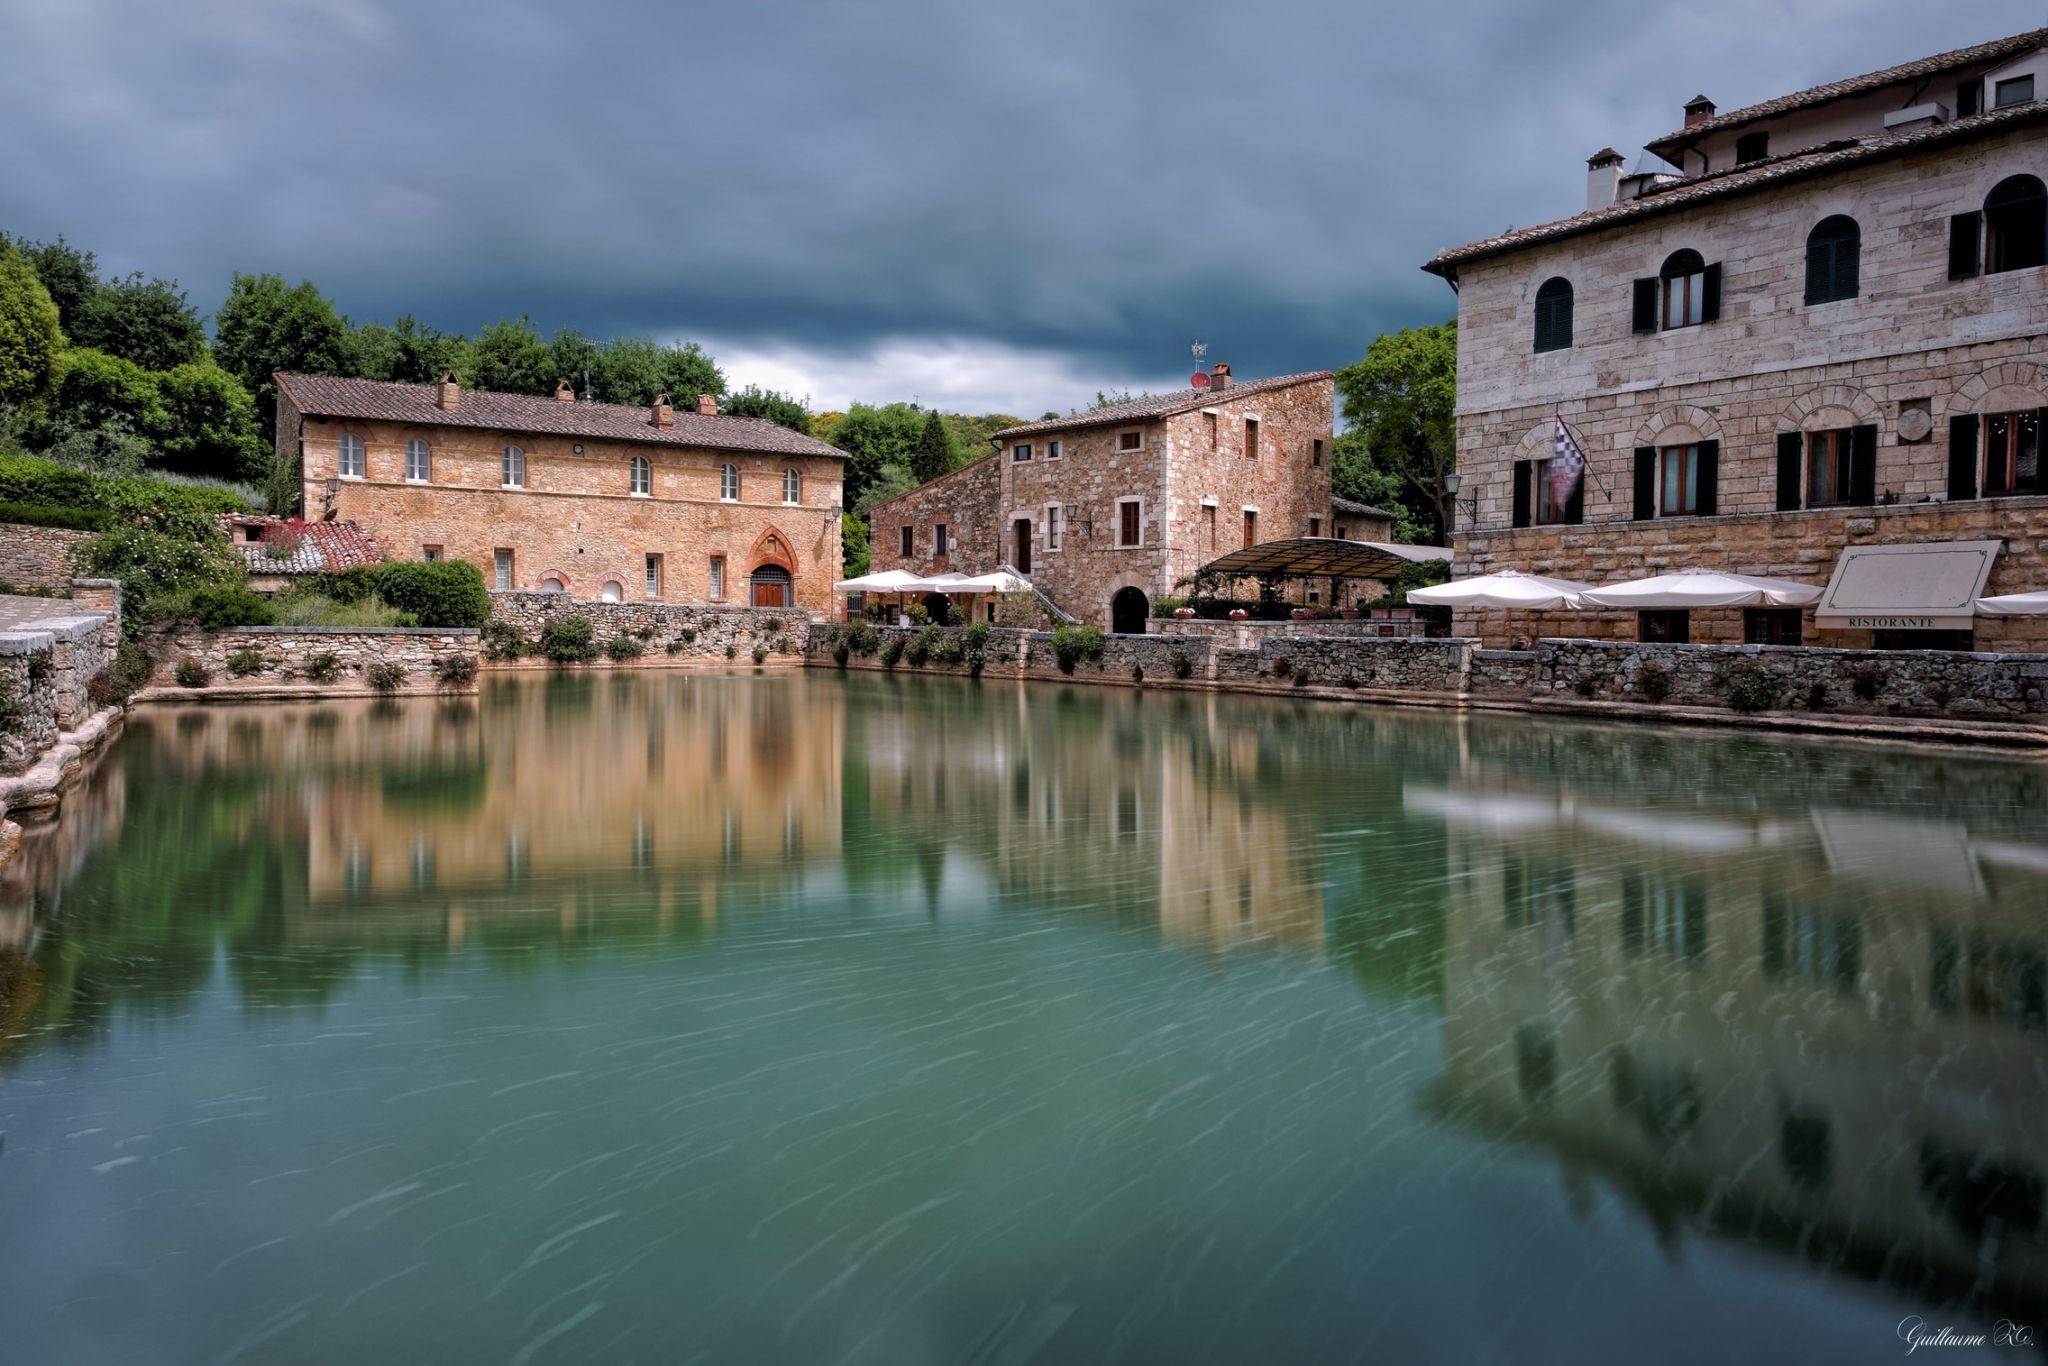 Bagno Vignoni Toscana Italy